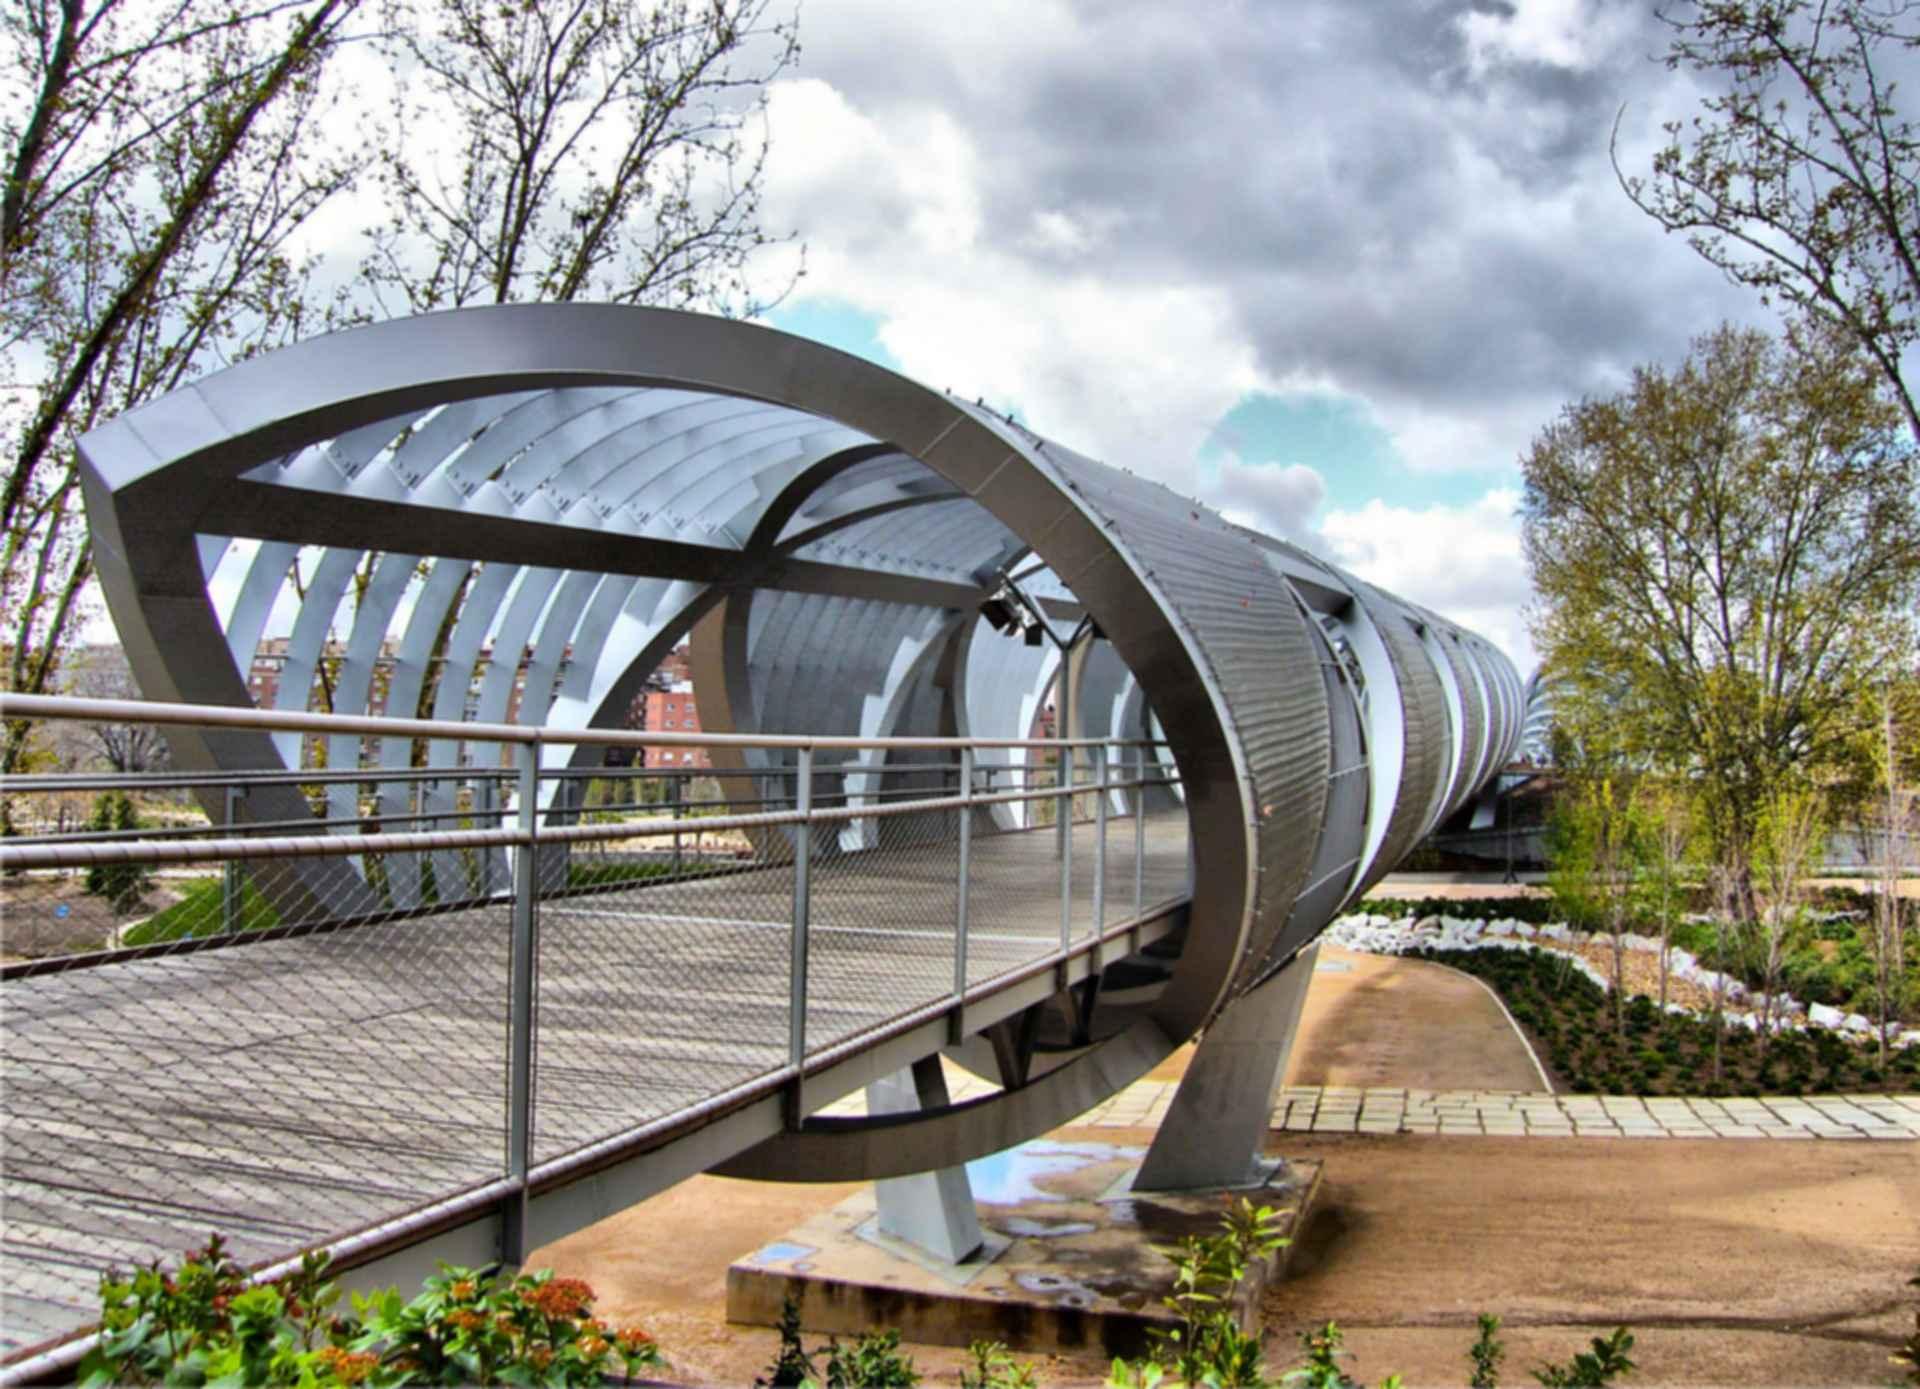 Arganzuela Footbridge by Day